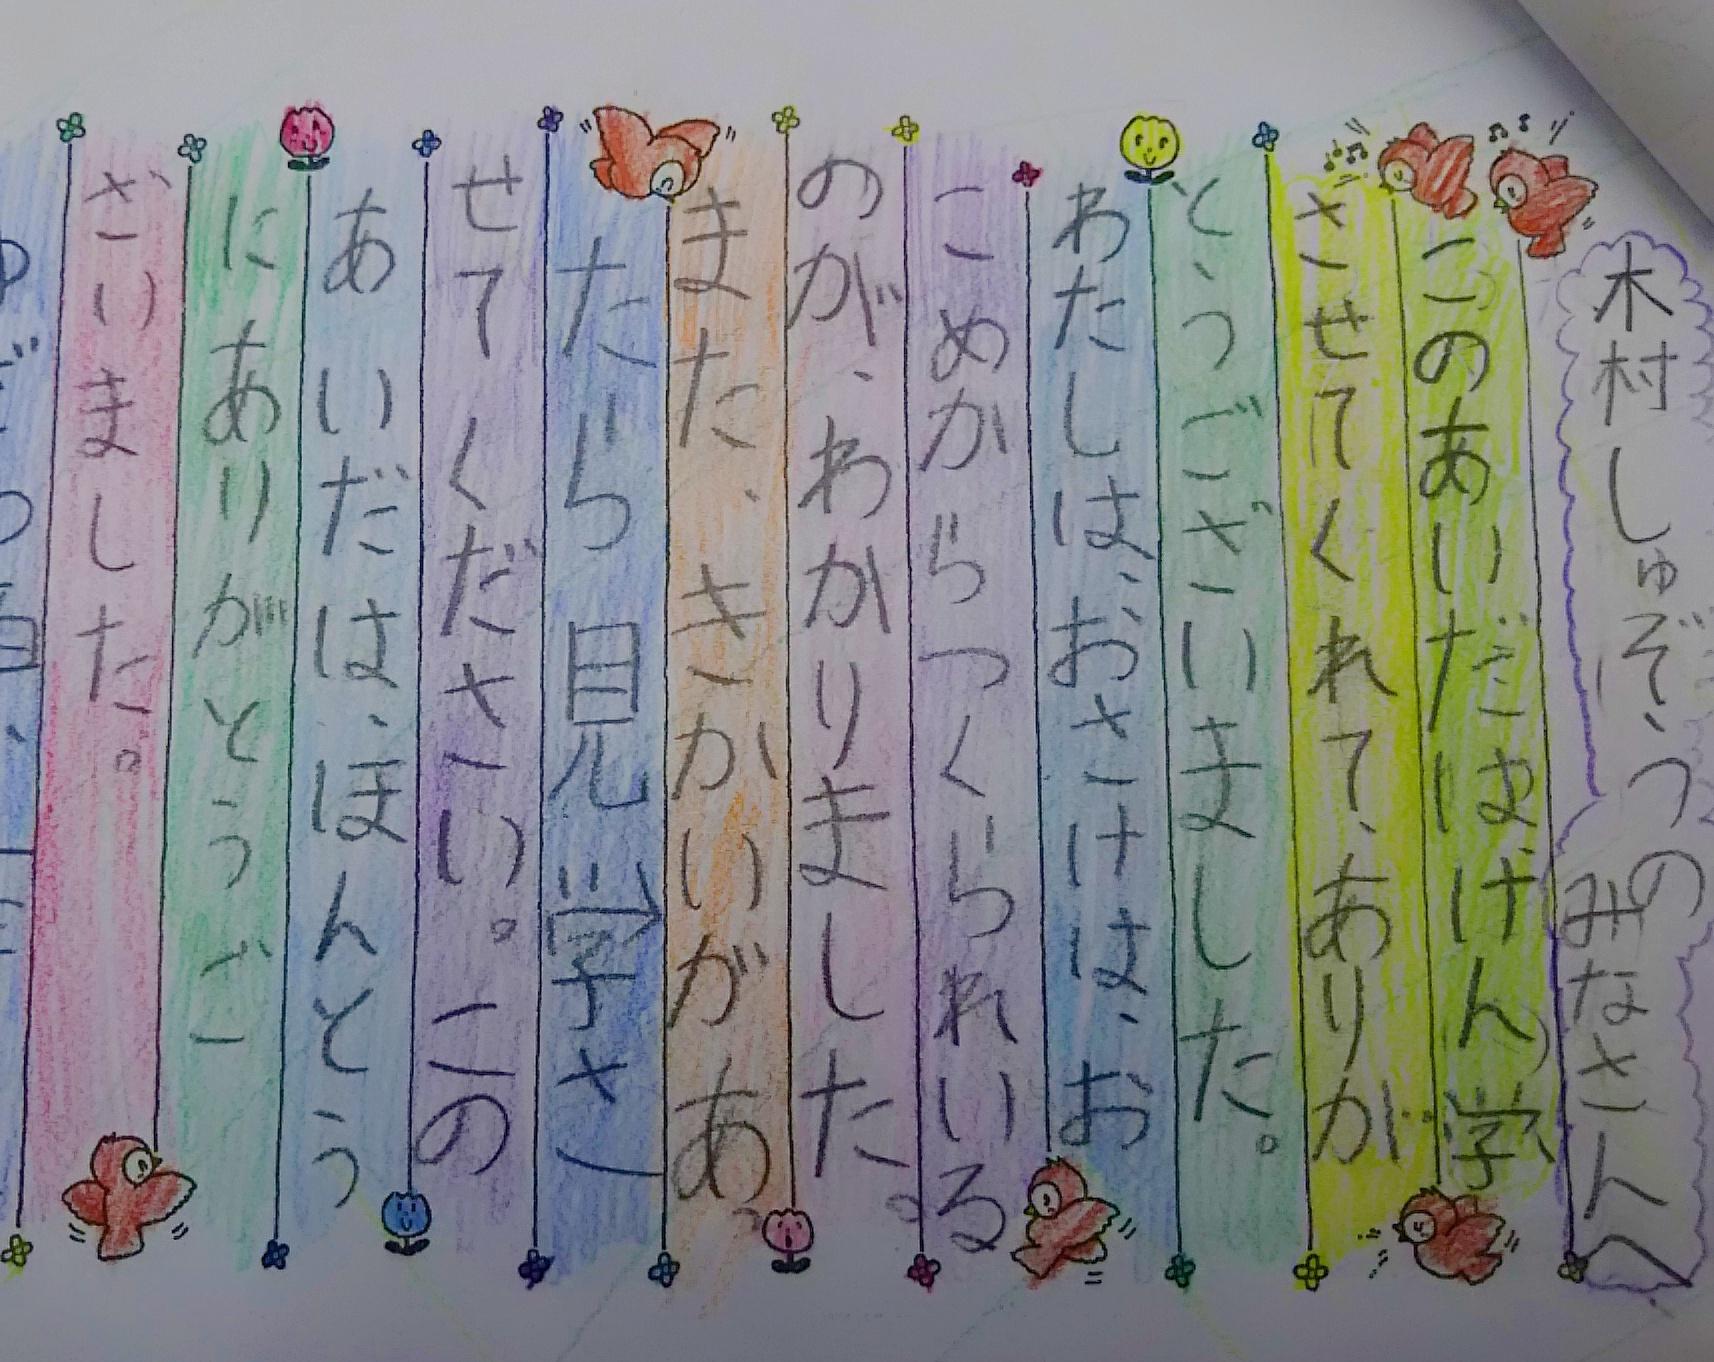 http://www.fukukomachi.com/blog/photo/C360_2017-10-25-09-34-39-378.jpg